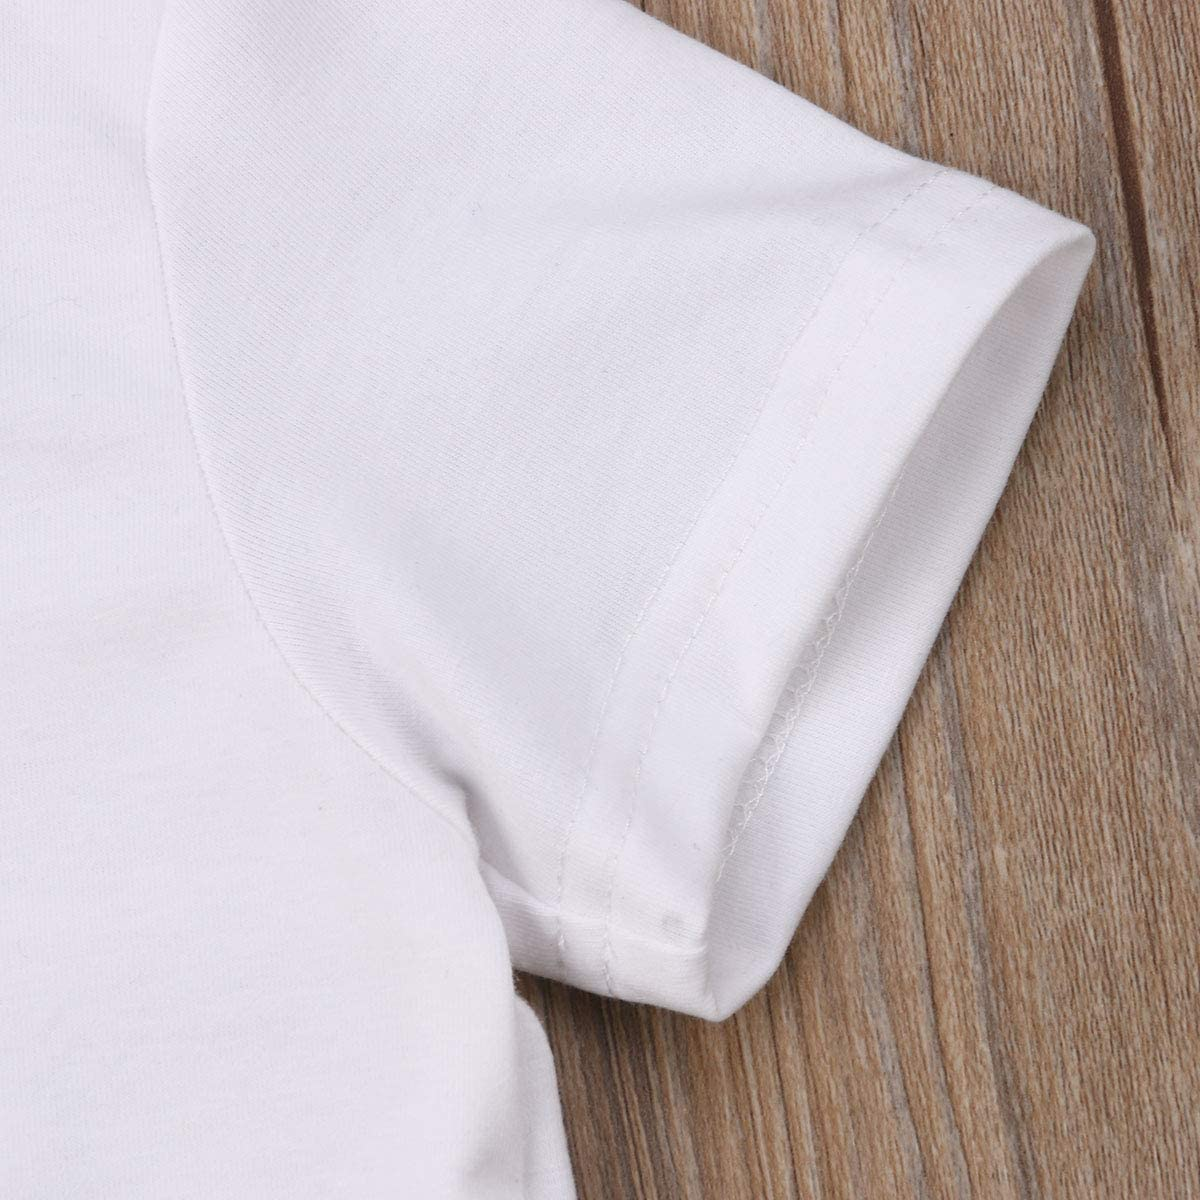 2Pcs Baby Boy Short Sleeve Shirt Short Pant Cute Pattern Toddler Infant Newborn Clothing Outfit Sets